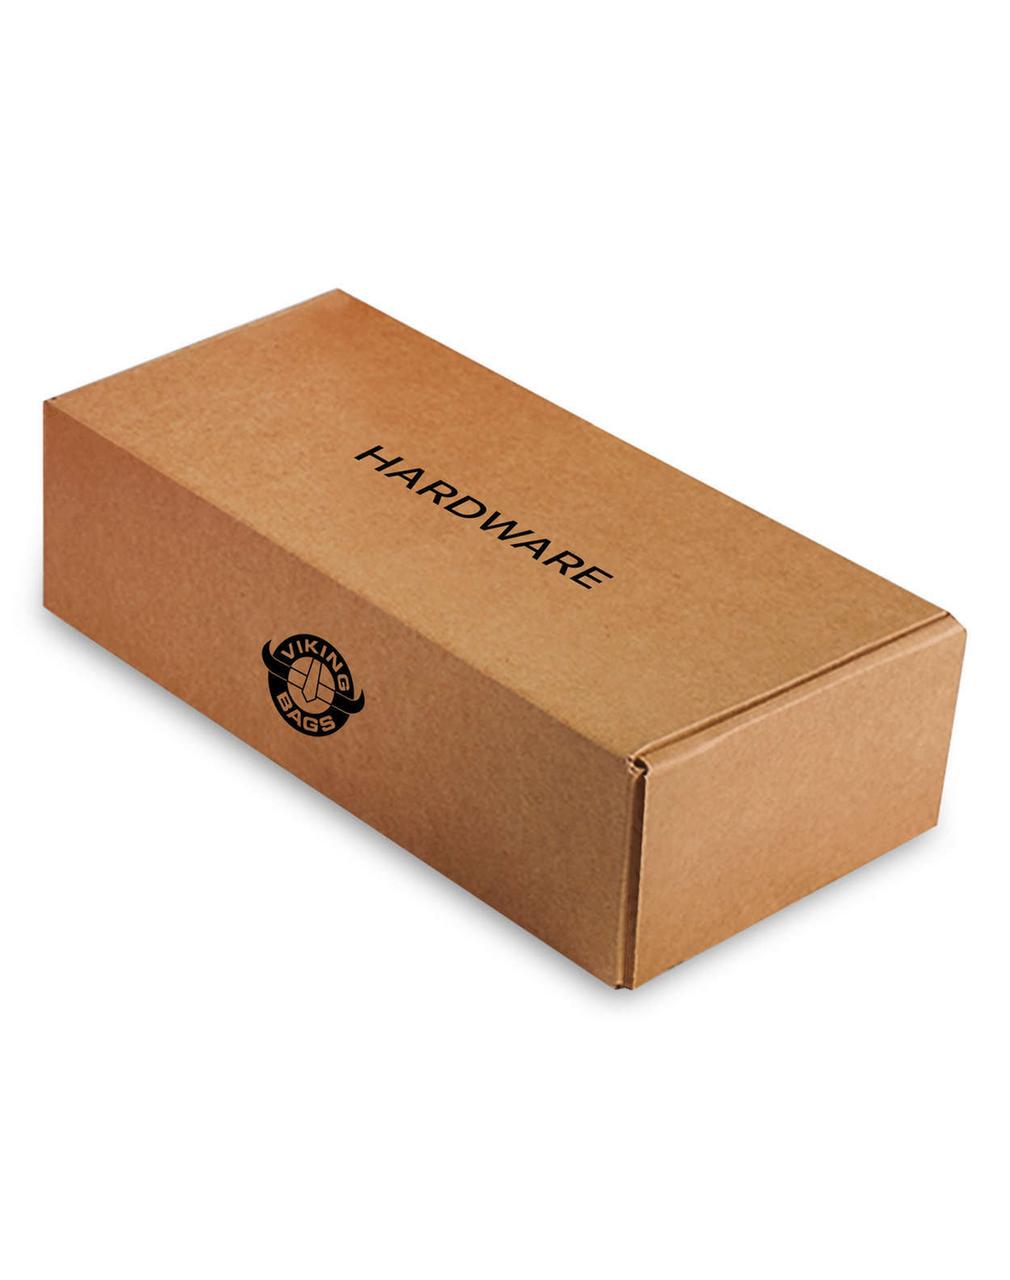 Honda 1500 Valkyrie Interstate Viking Lamellar Large Leather Covered Hard Saddlebags Hardware Box